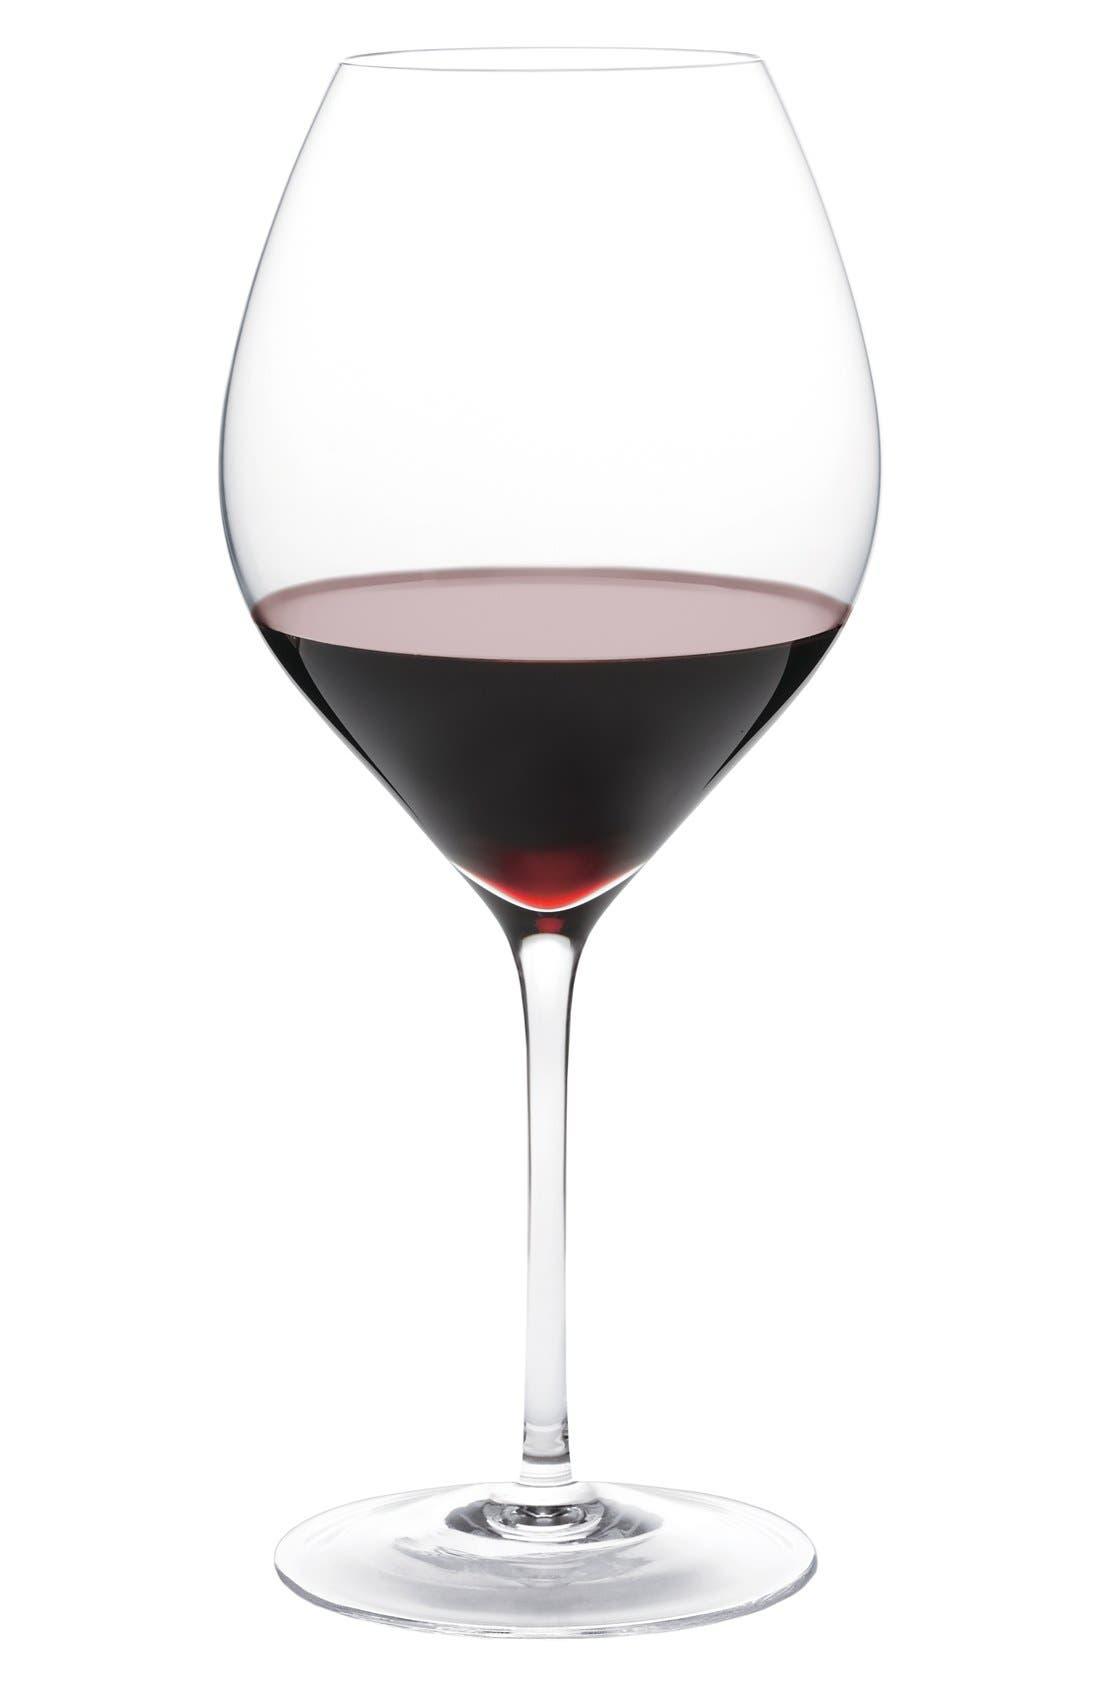 Alternate Image 1 Selected - Nordstrom at Home Ravenna Set of 4 Red Wine Glasses